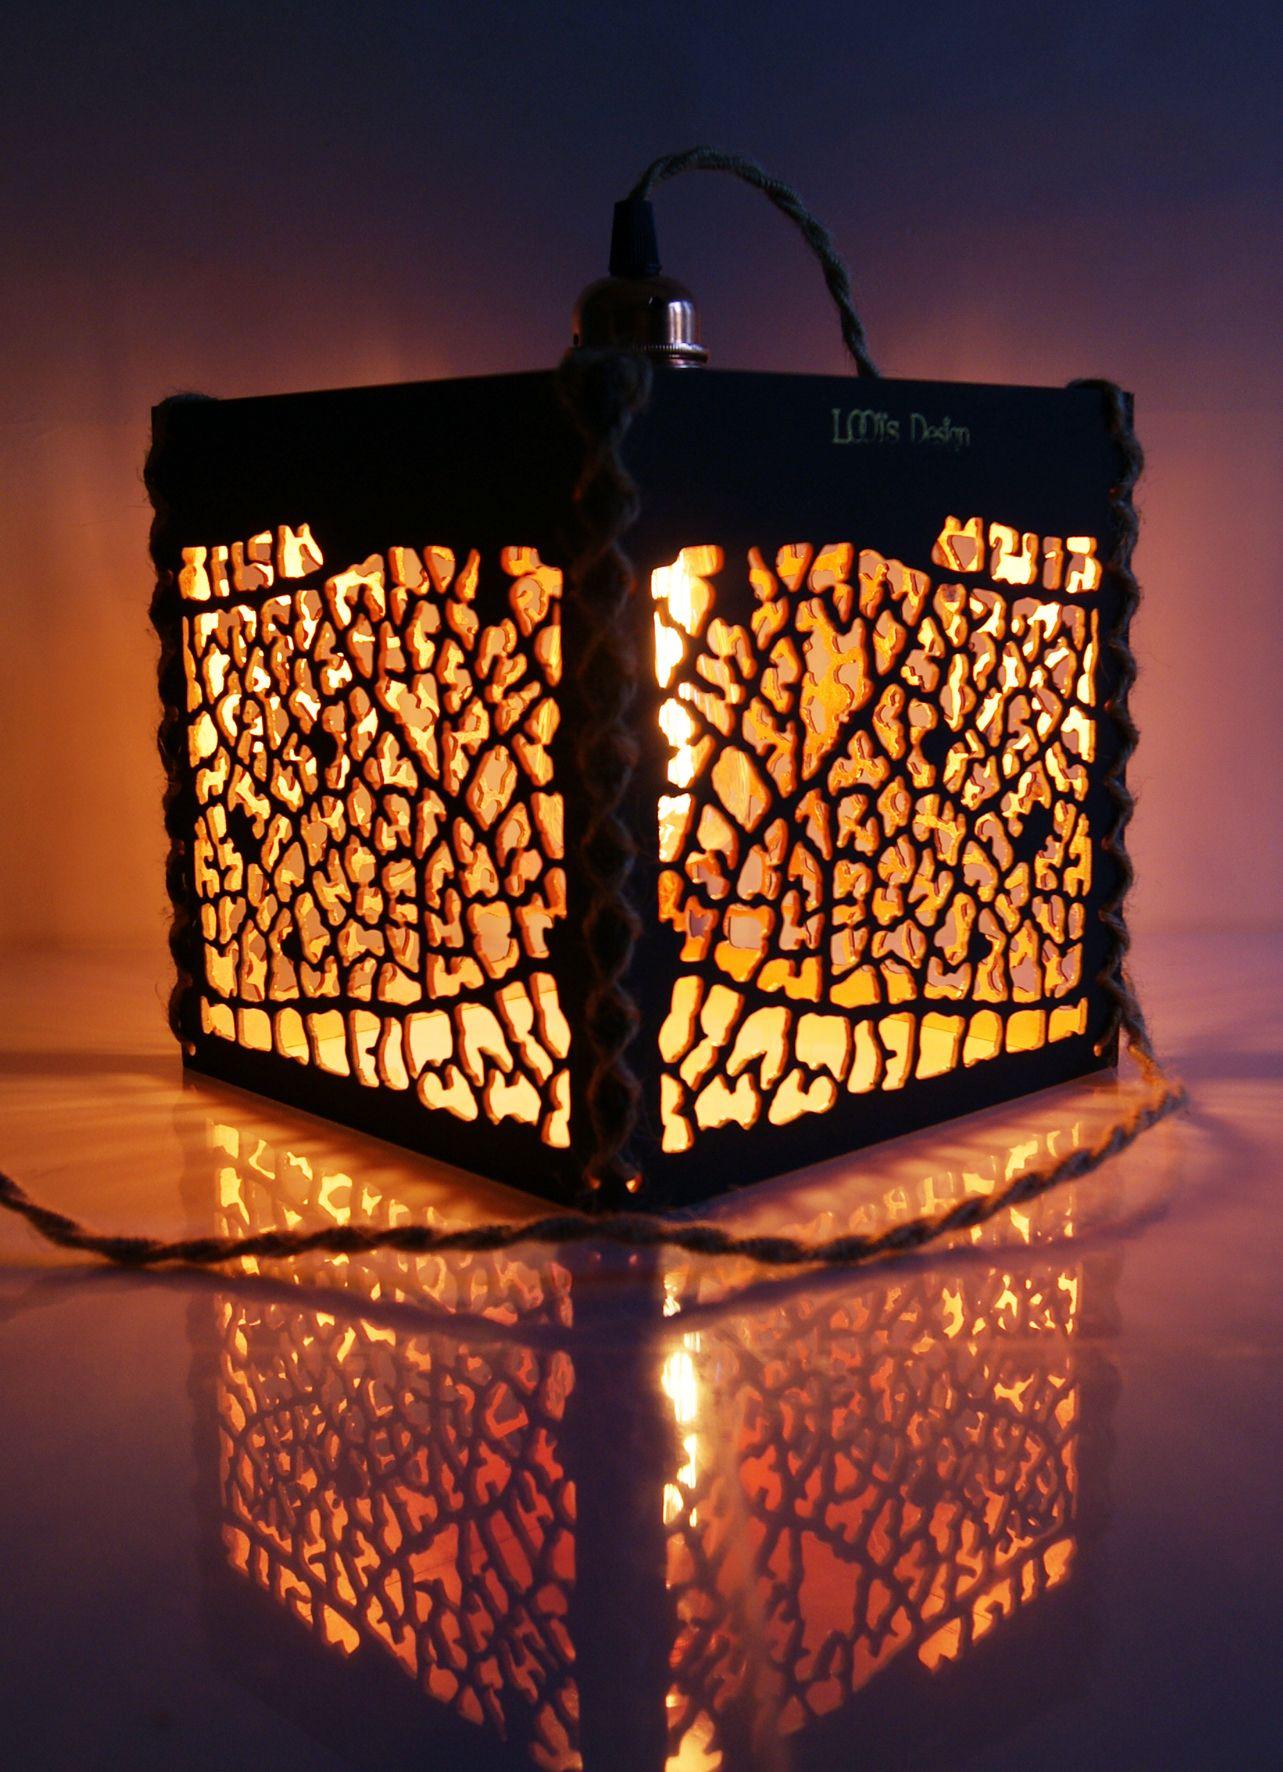 Lampe baladeuse cloche Fall bois noir cuivre dorure feuille de